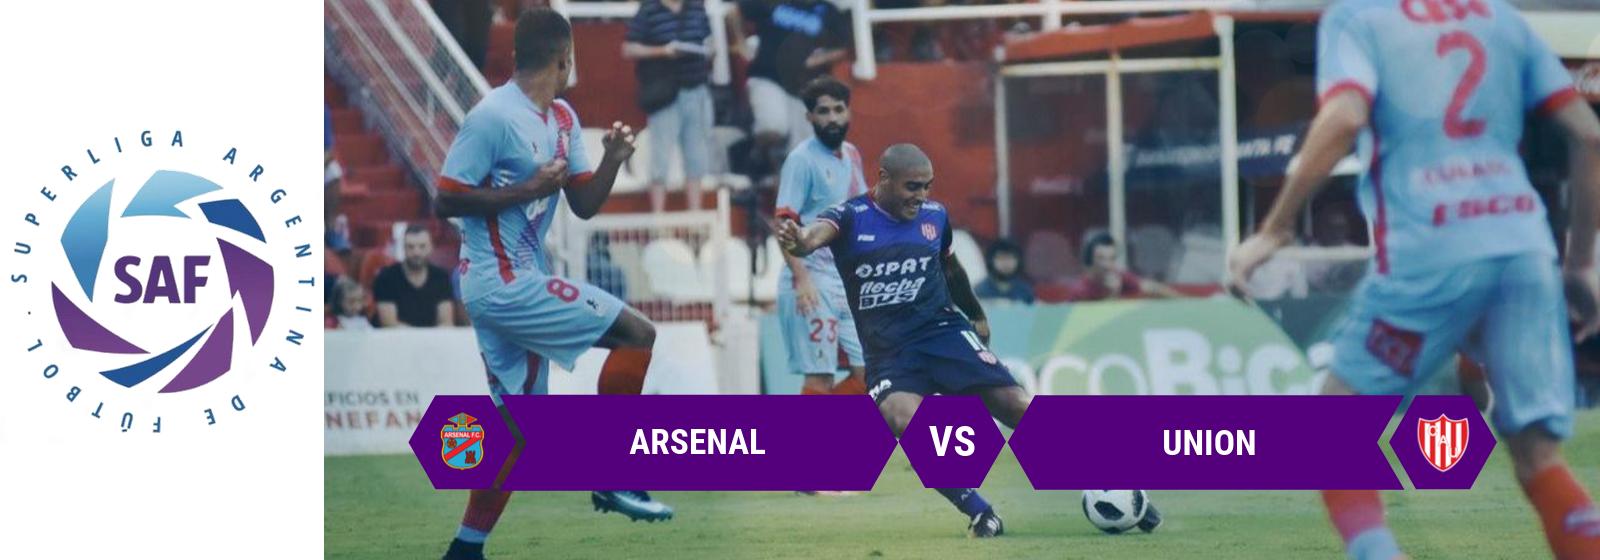 SAF Arsenal Vs. Union Asian Connect